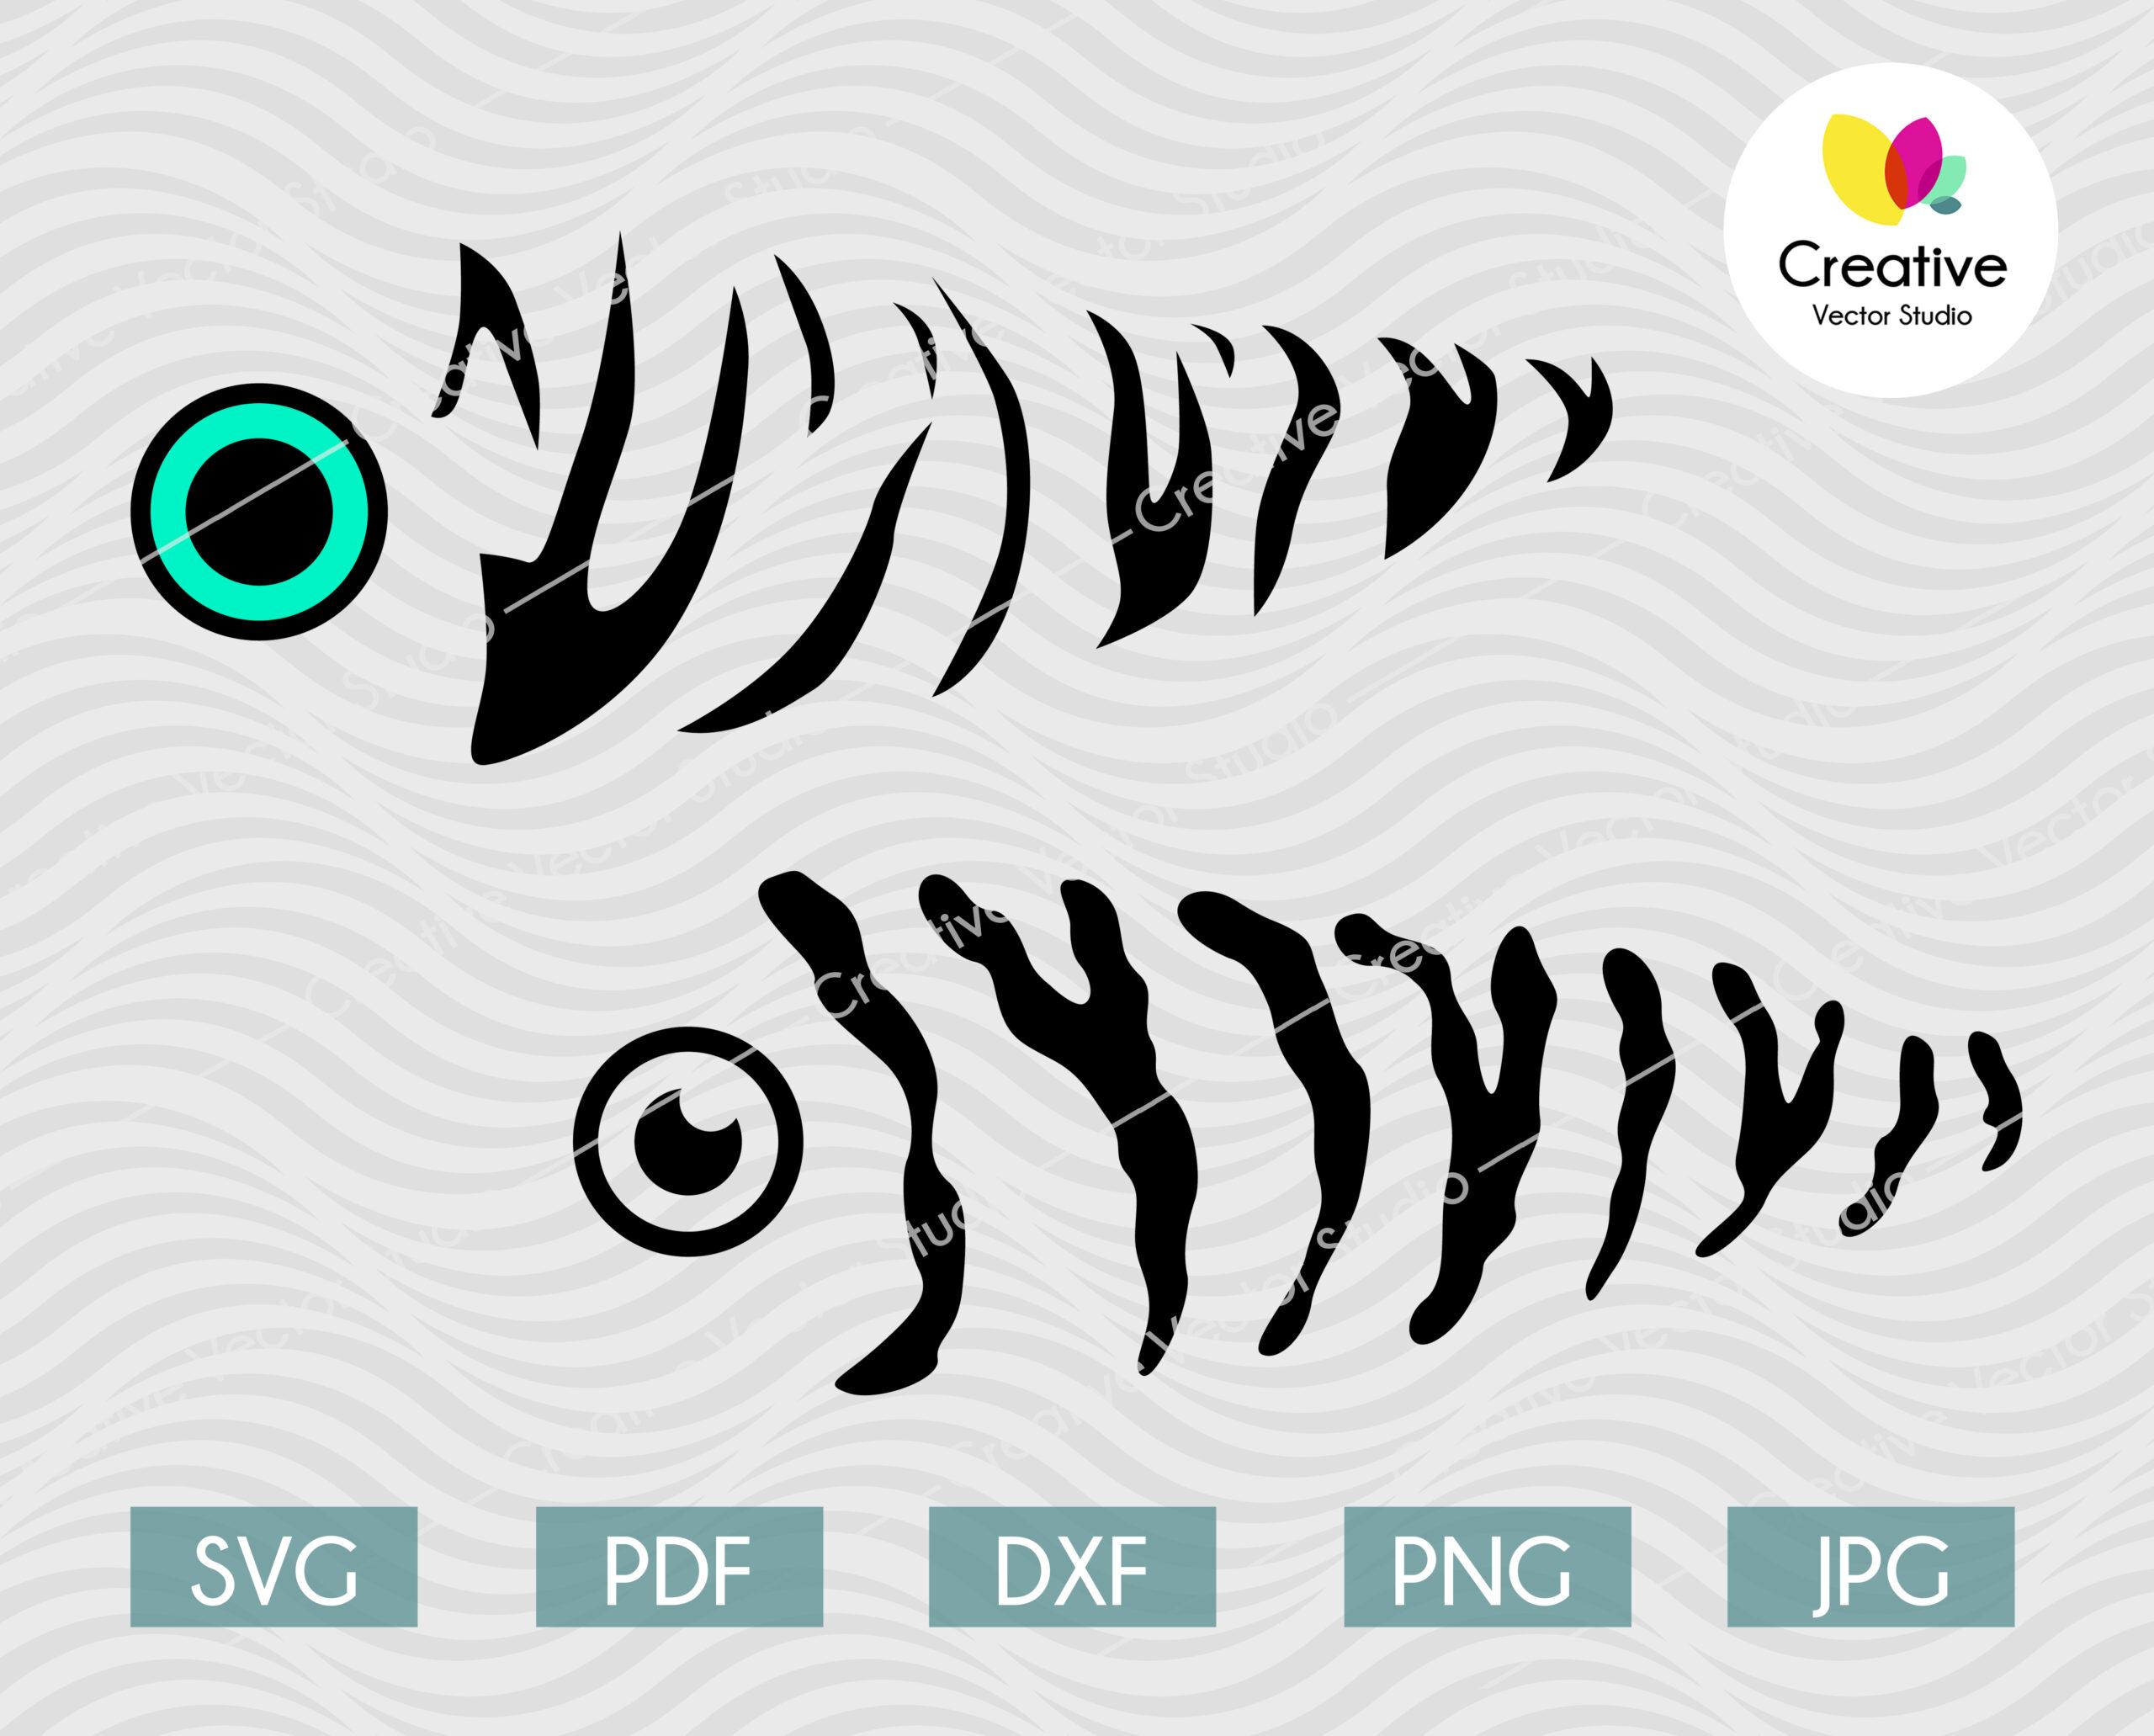 Download Fishing Lure Svg Bundle 1 Creative Vector Studio